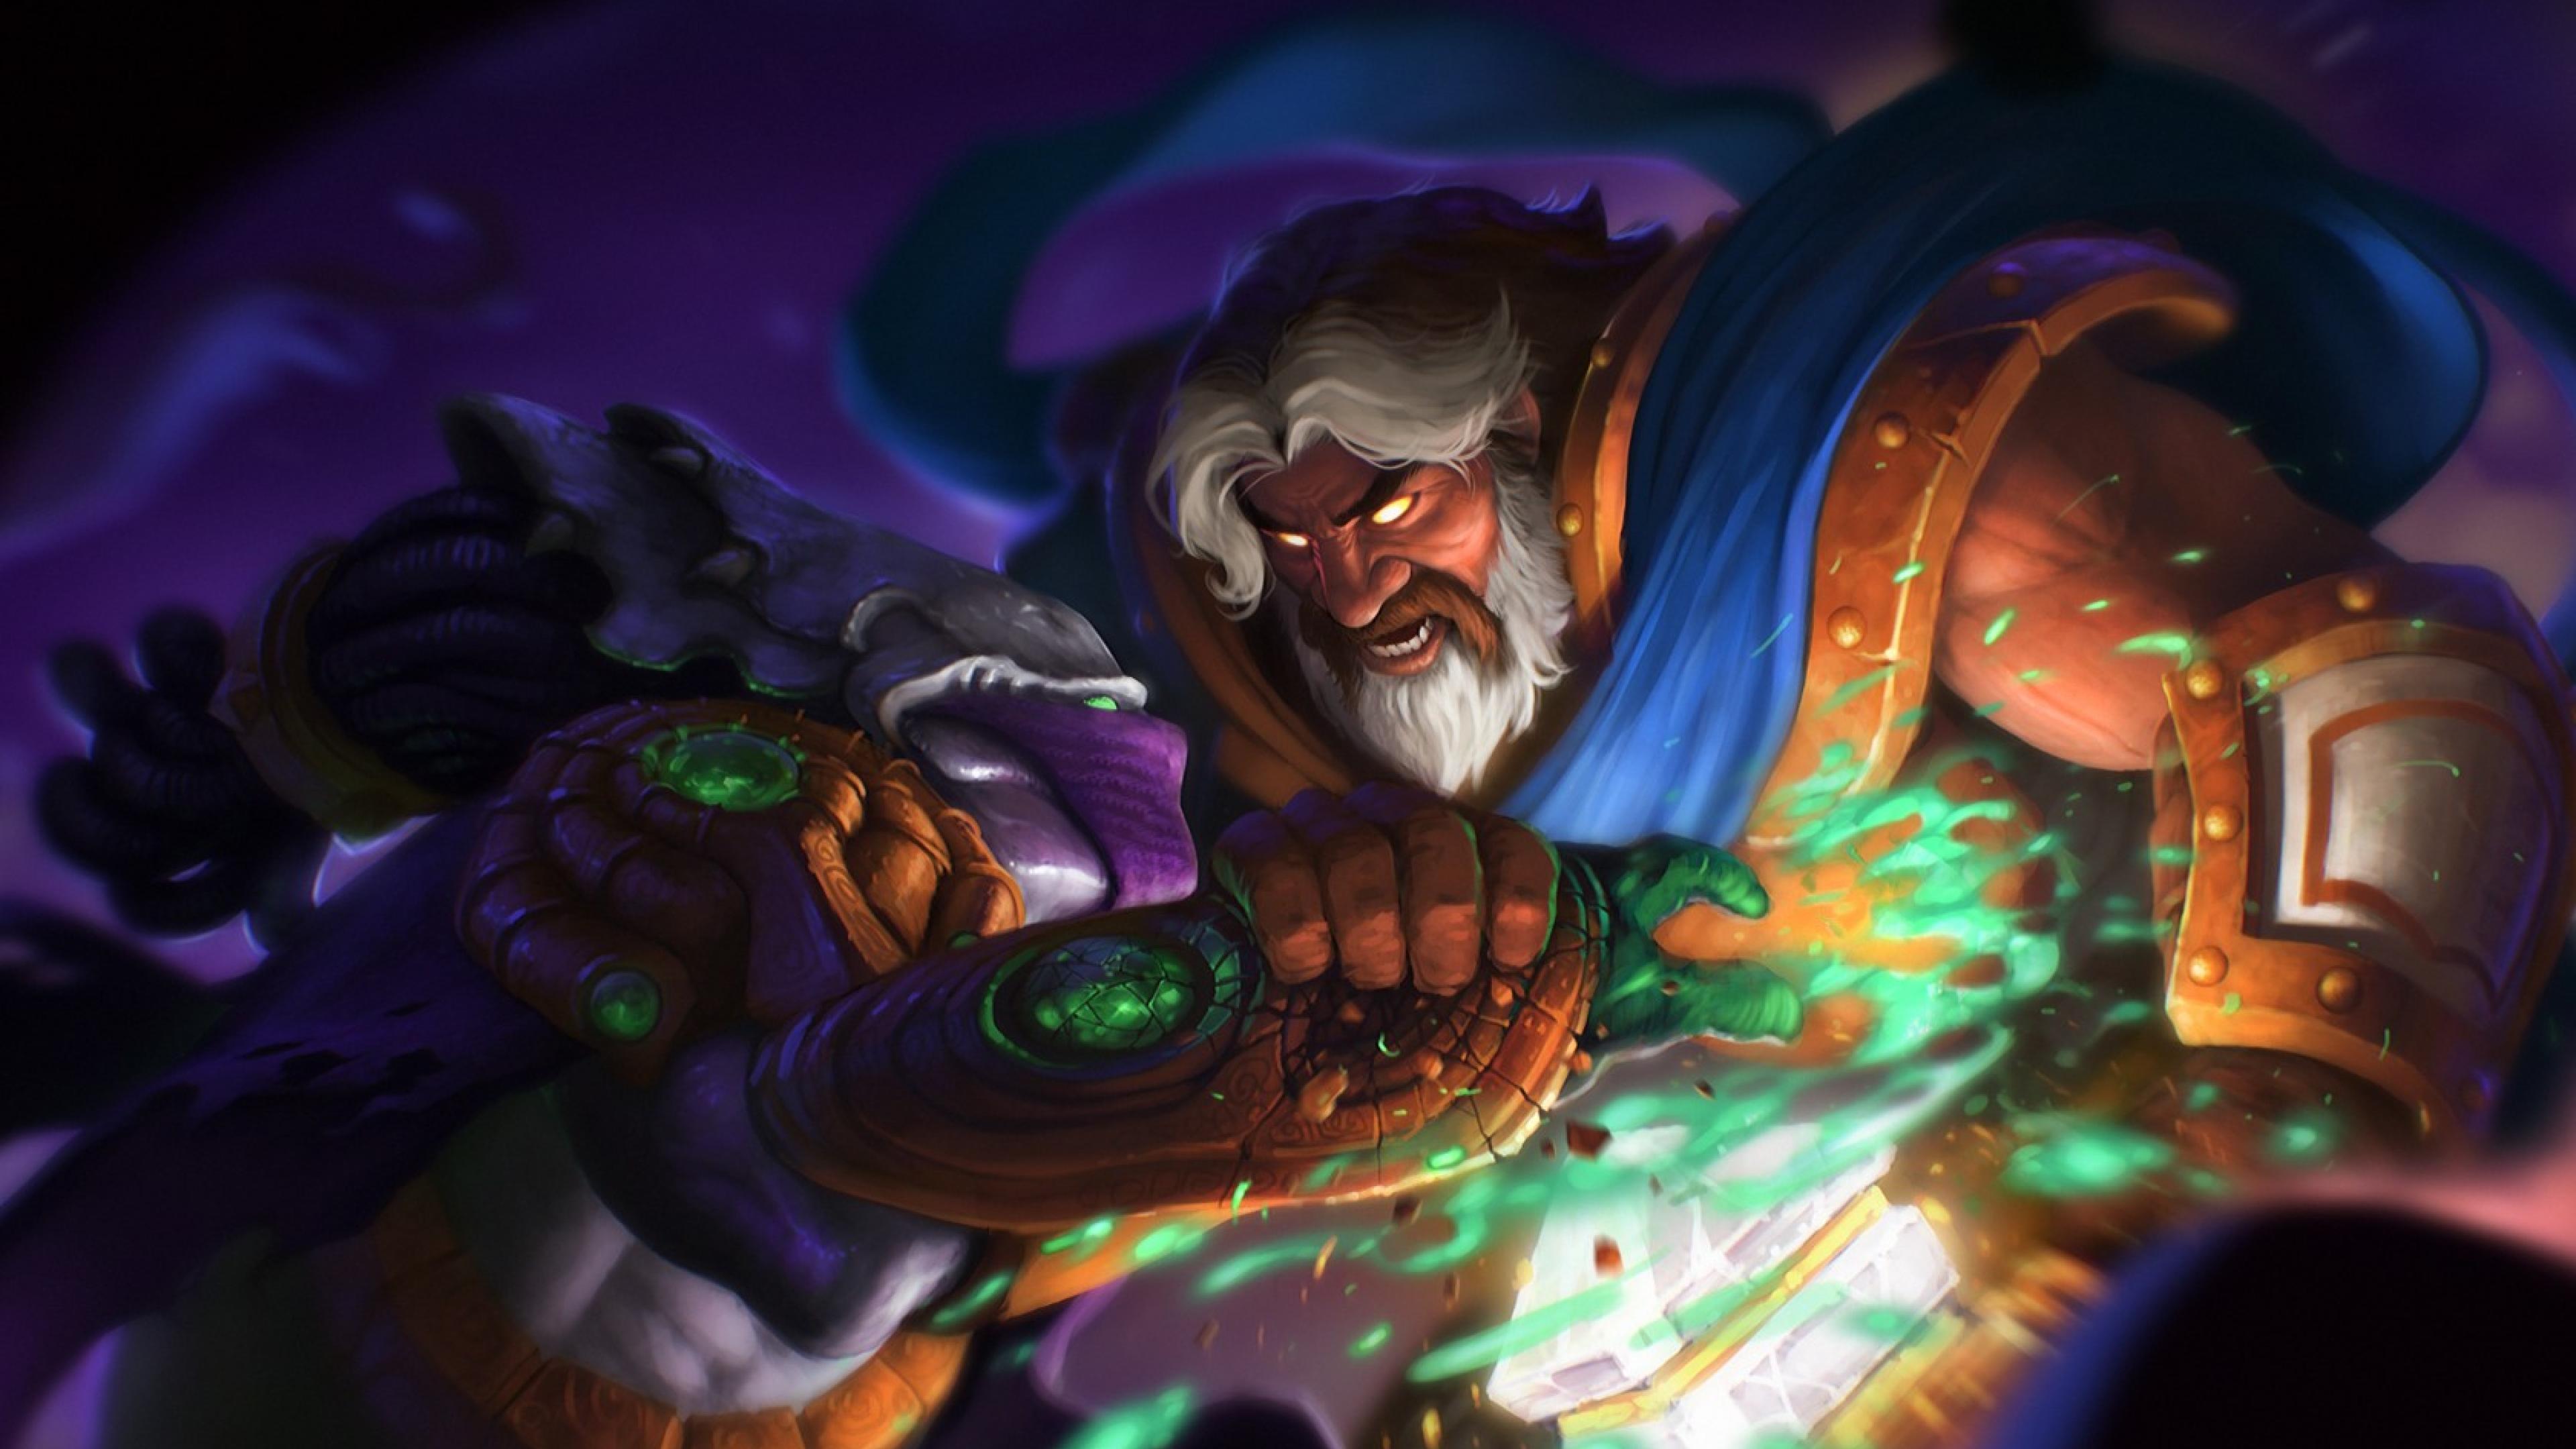 3840x2160 World Of Warcraft Heroes Of The Storm Zeratul 4k